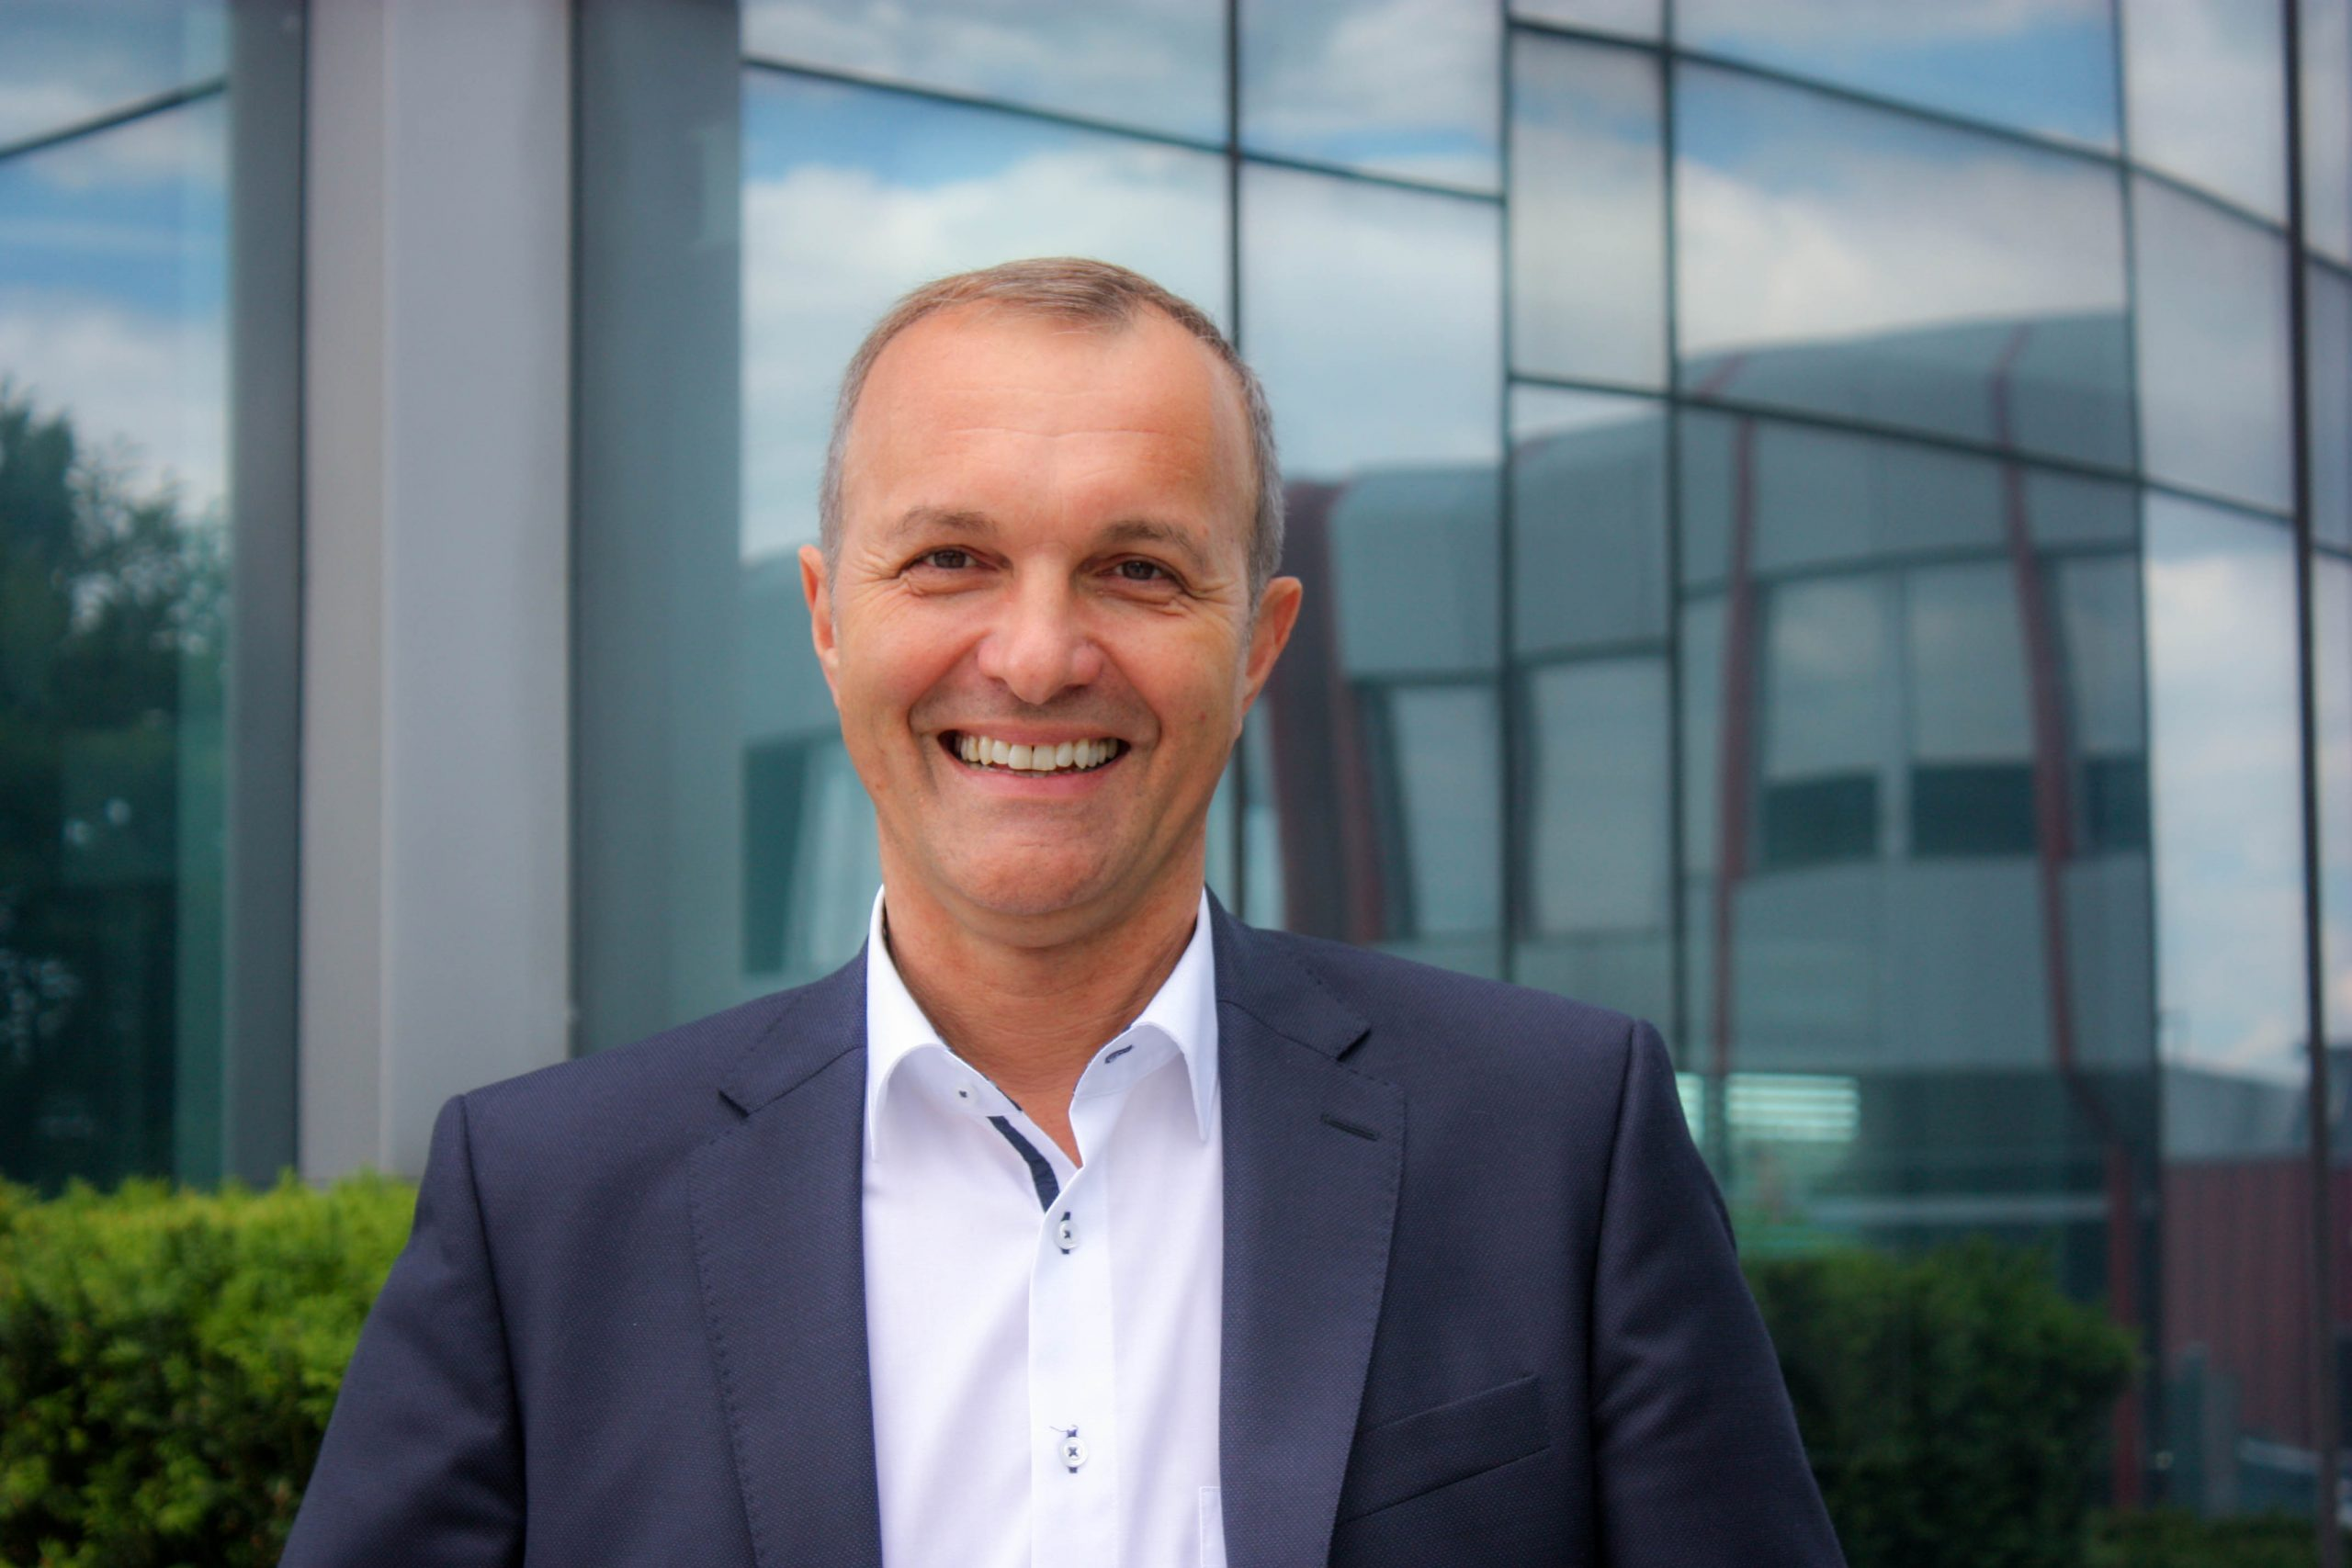 Ing. Werner König